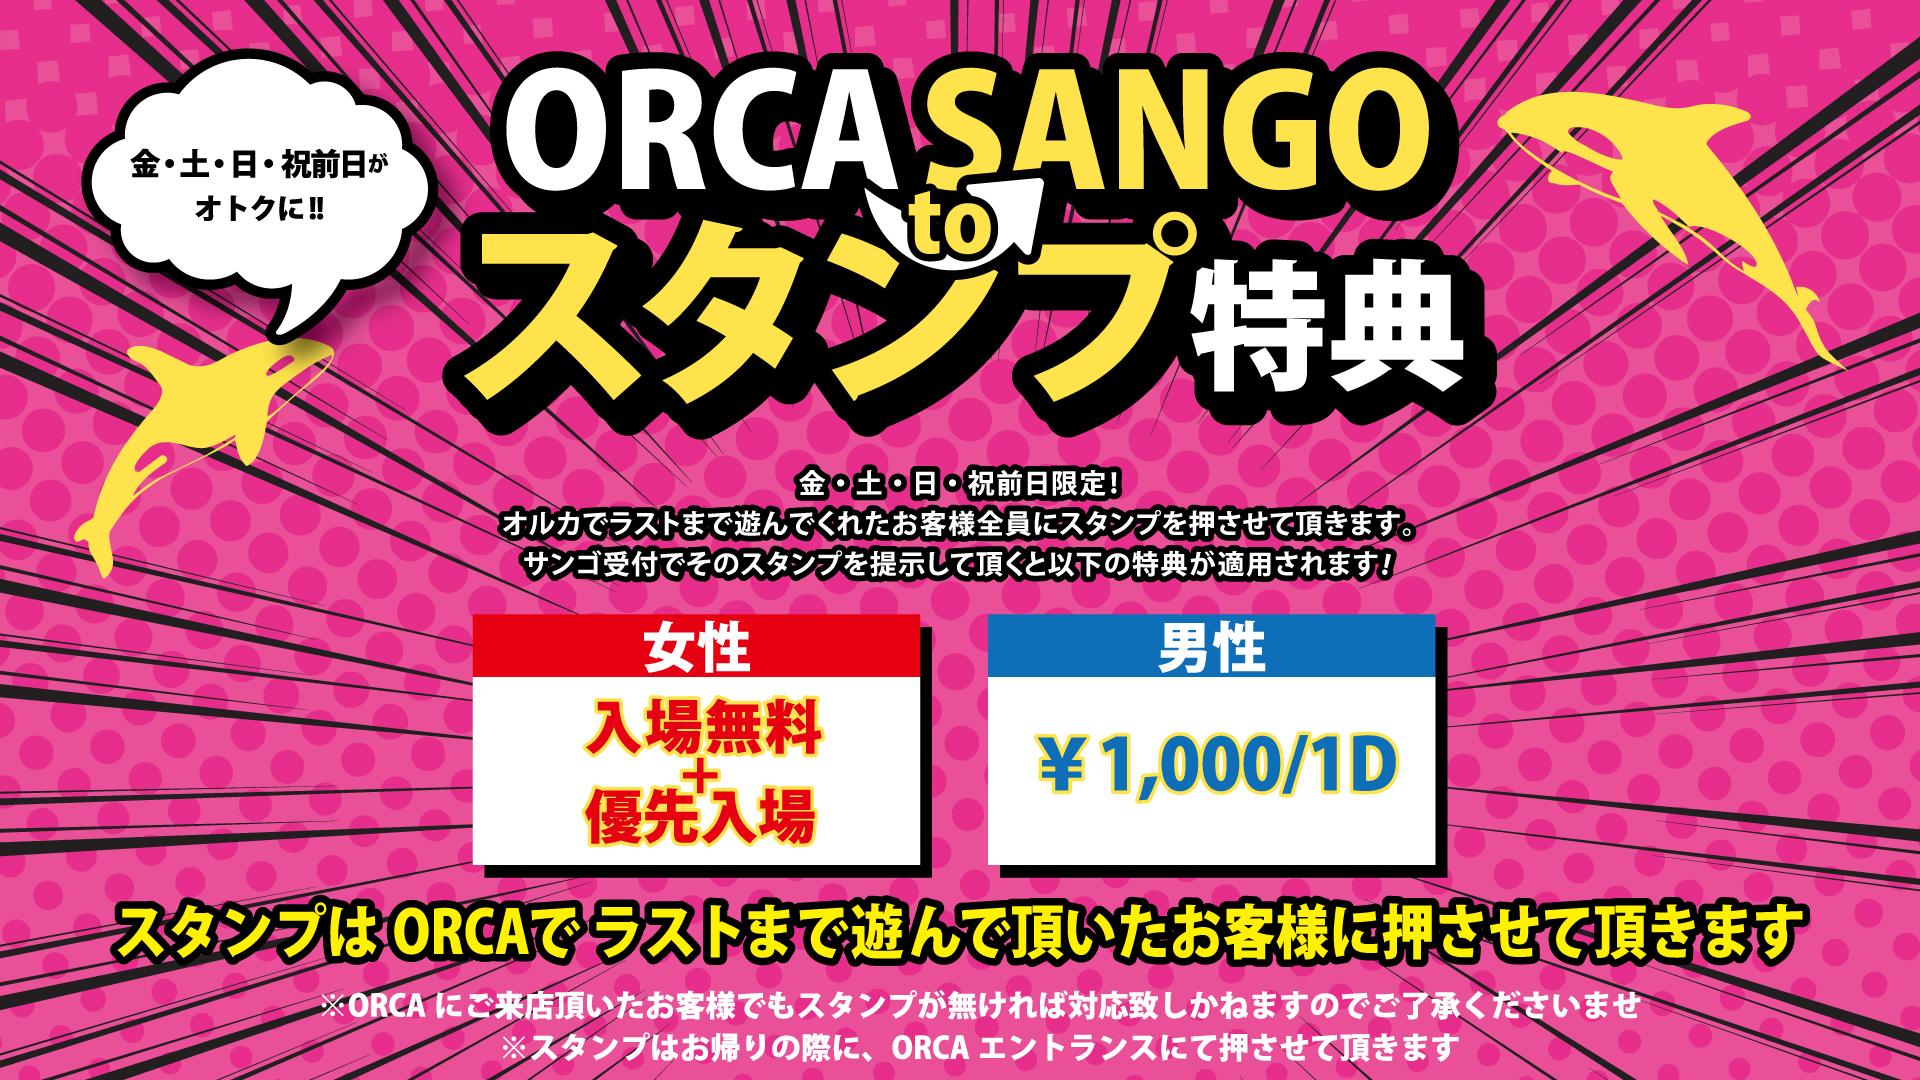 ORCA to SANGO スタンプ特典